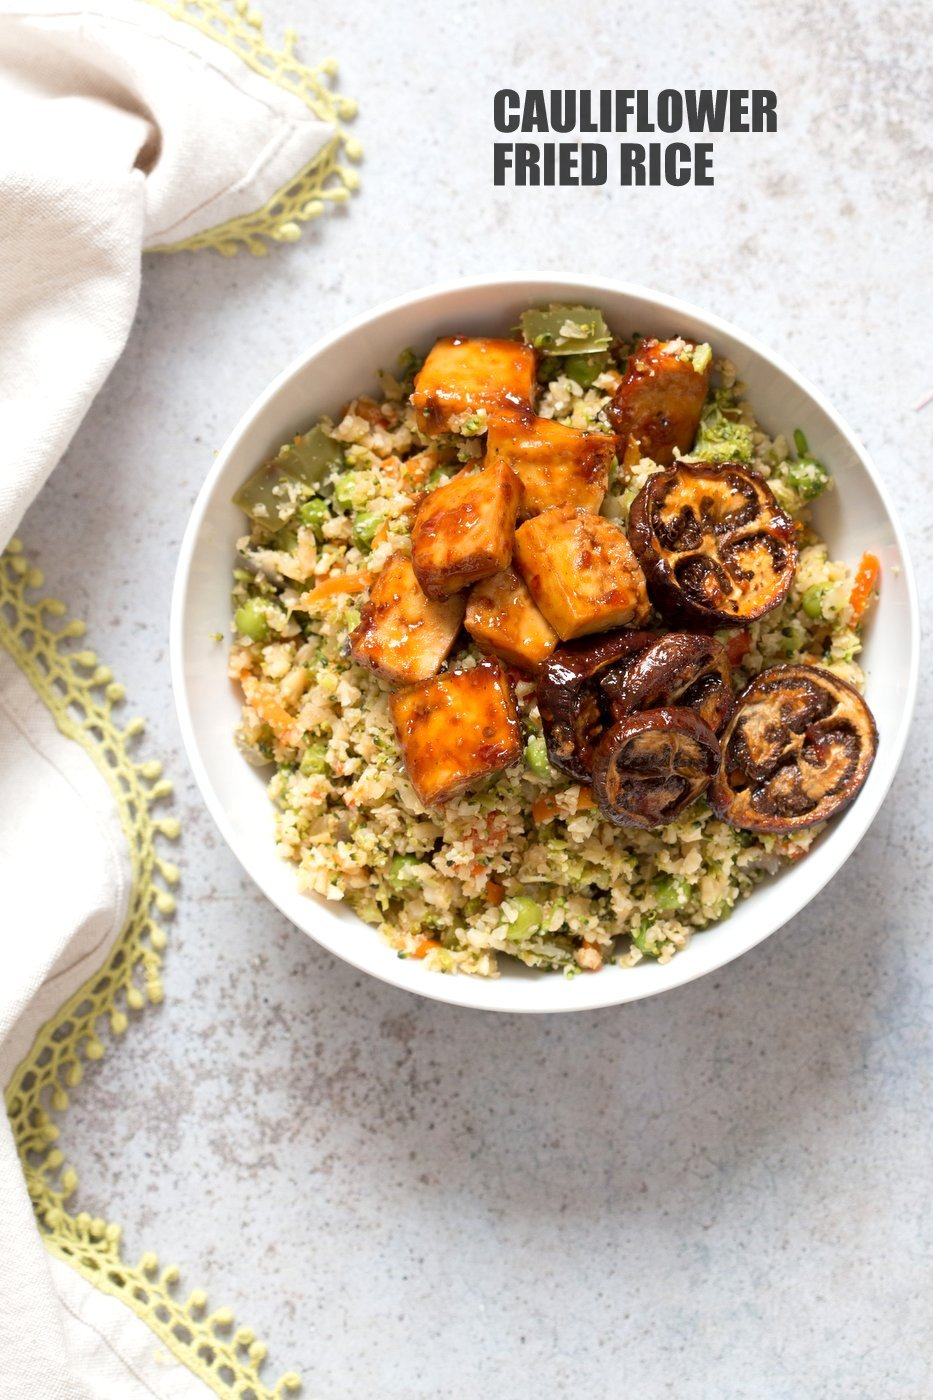 Cauliflower fried rice 1 pot vegan richa cauliflower fried rice easy 1 pot fried rice no grains low carb ccuart Gallery